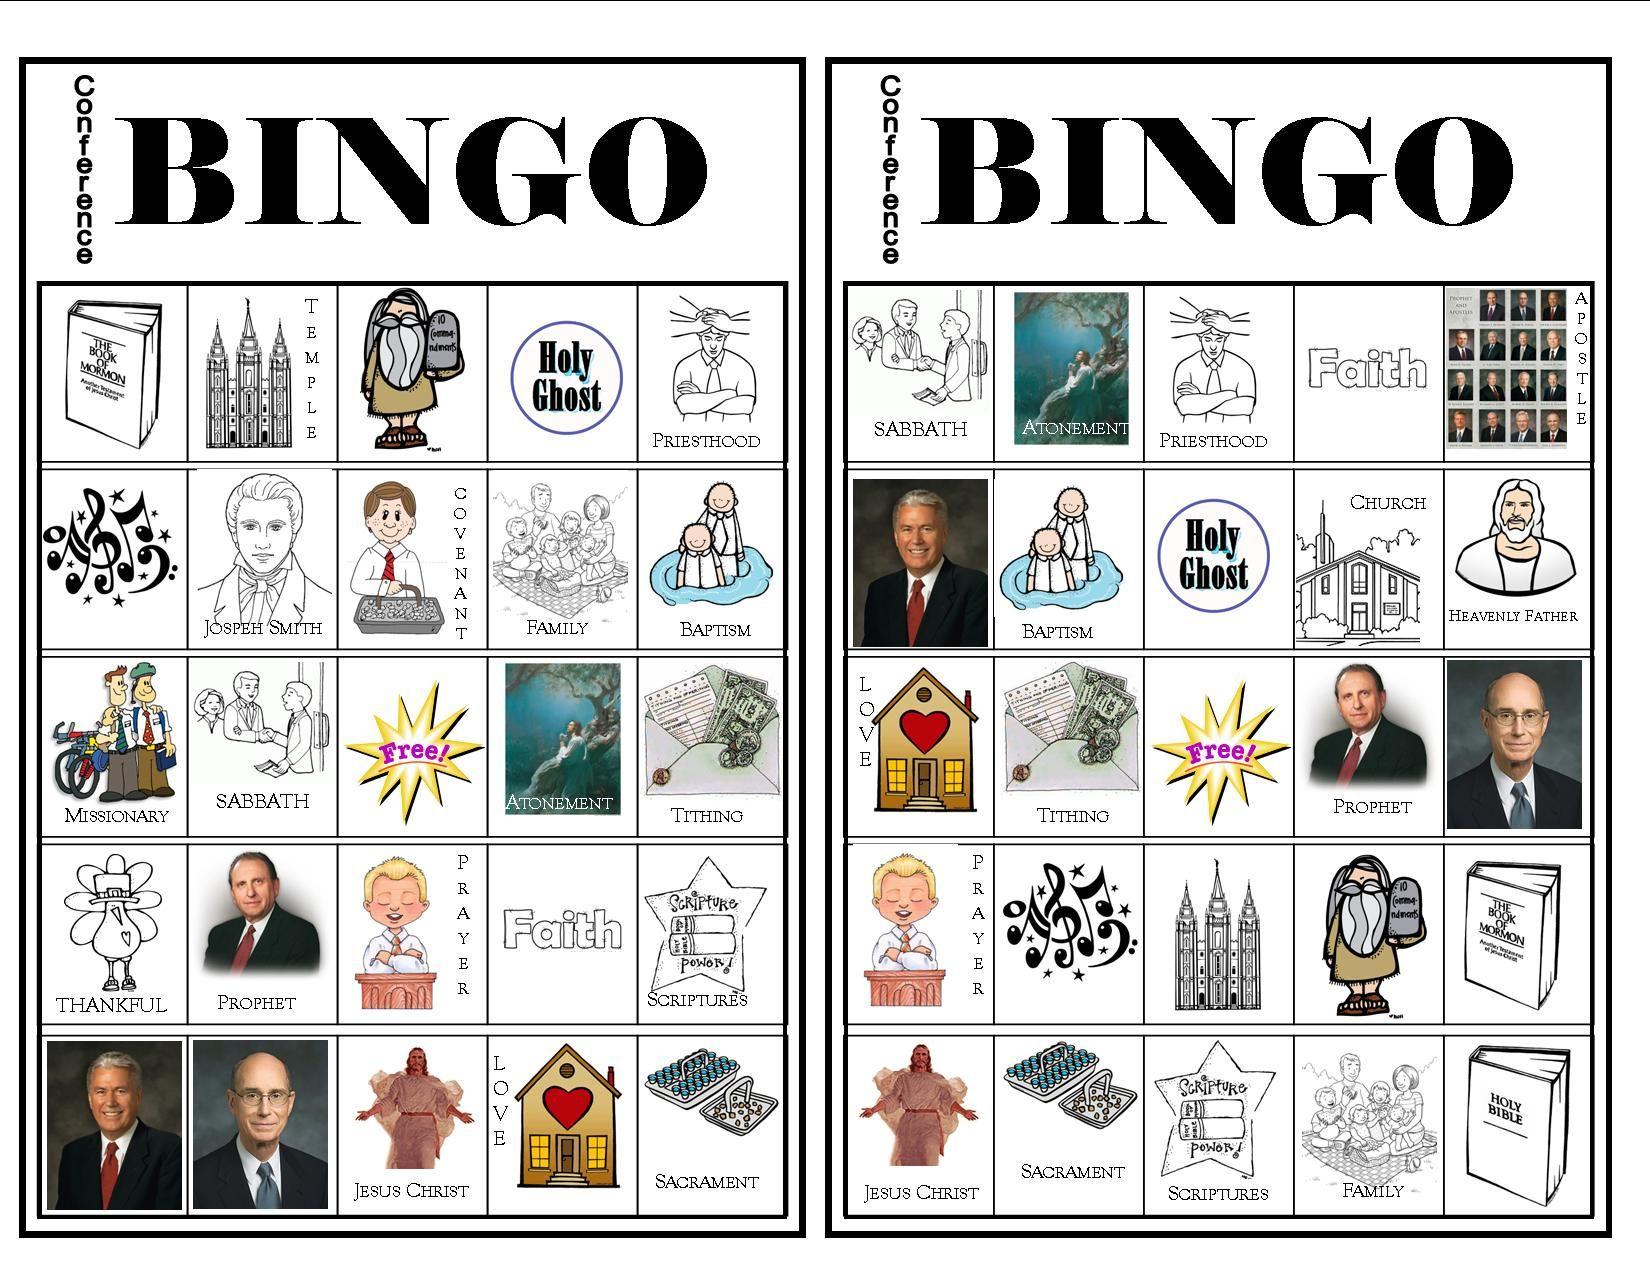 Conference Bingo #3 - More Bingo Cards For General